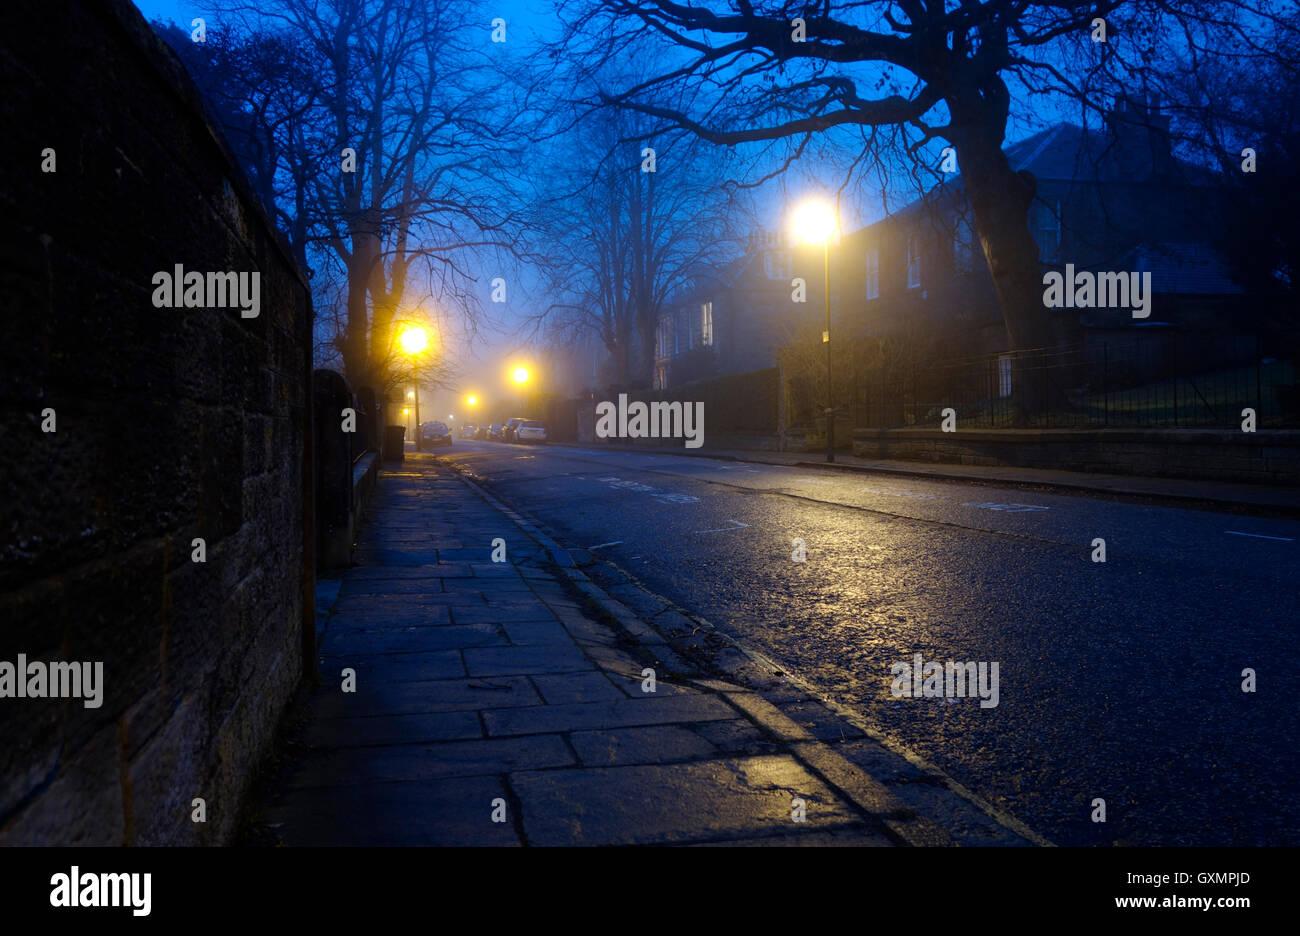 Back street in Morningside, Edinburgh on a foggy winter's evening - Stock Image